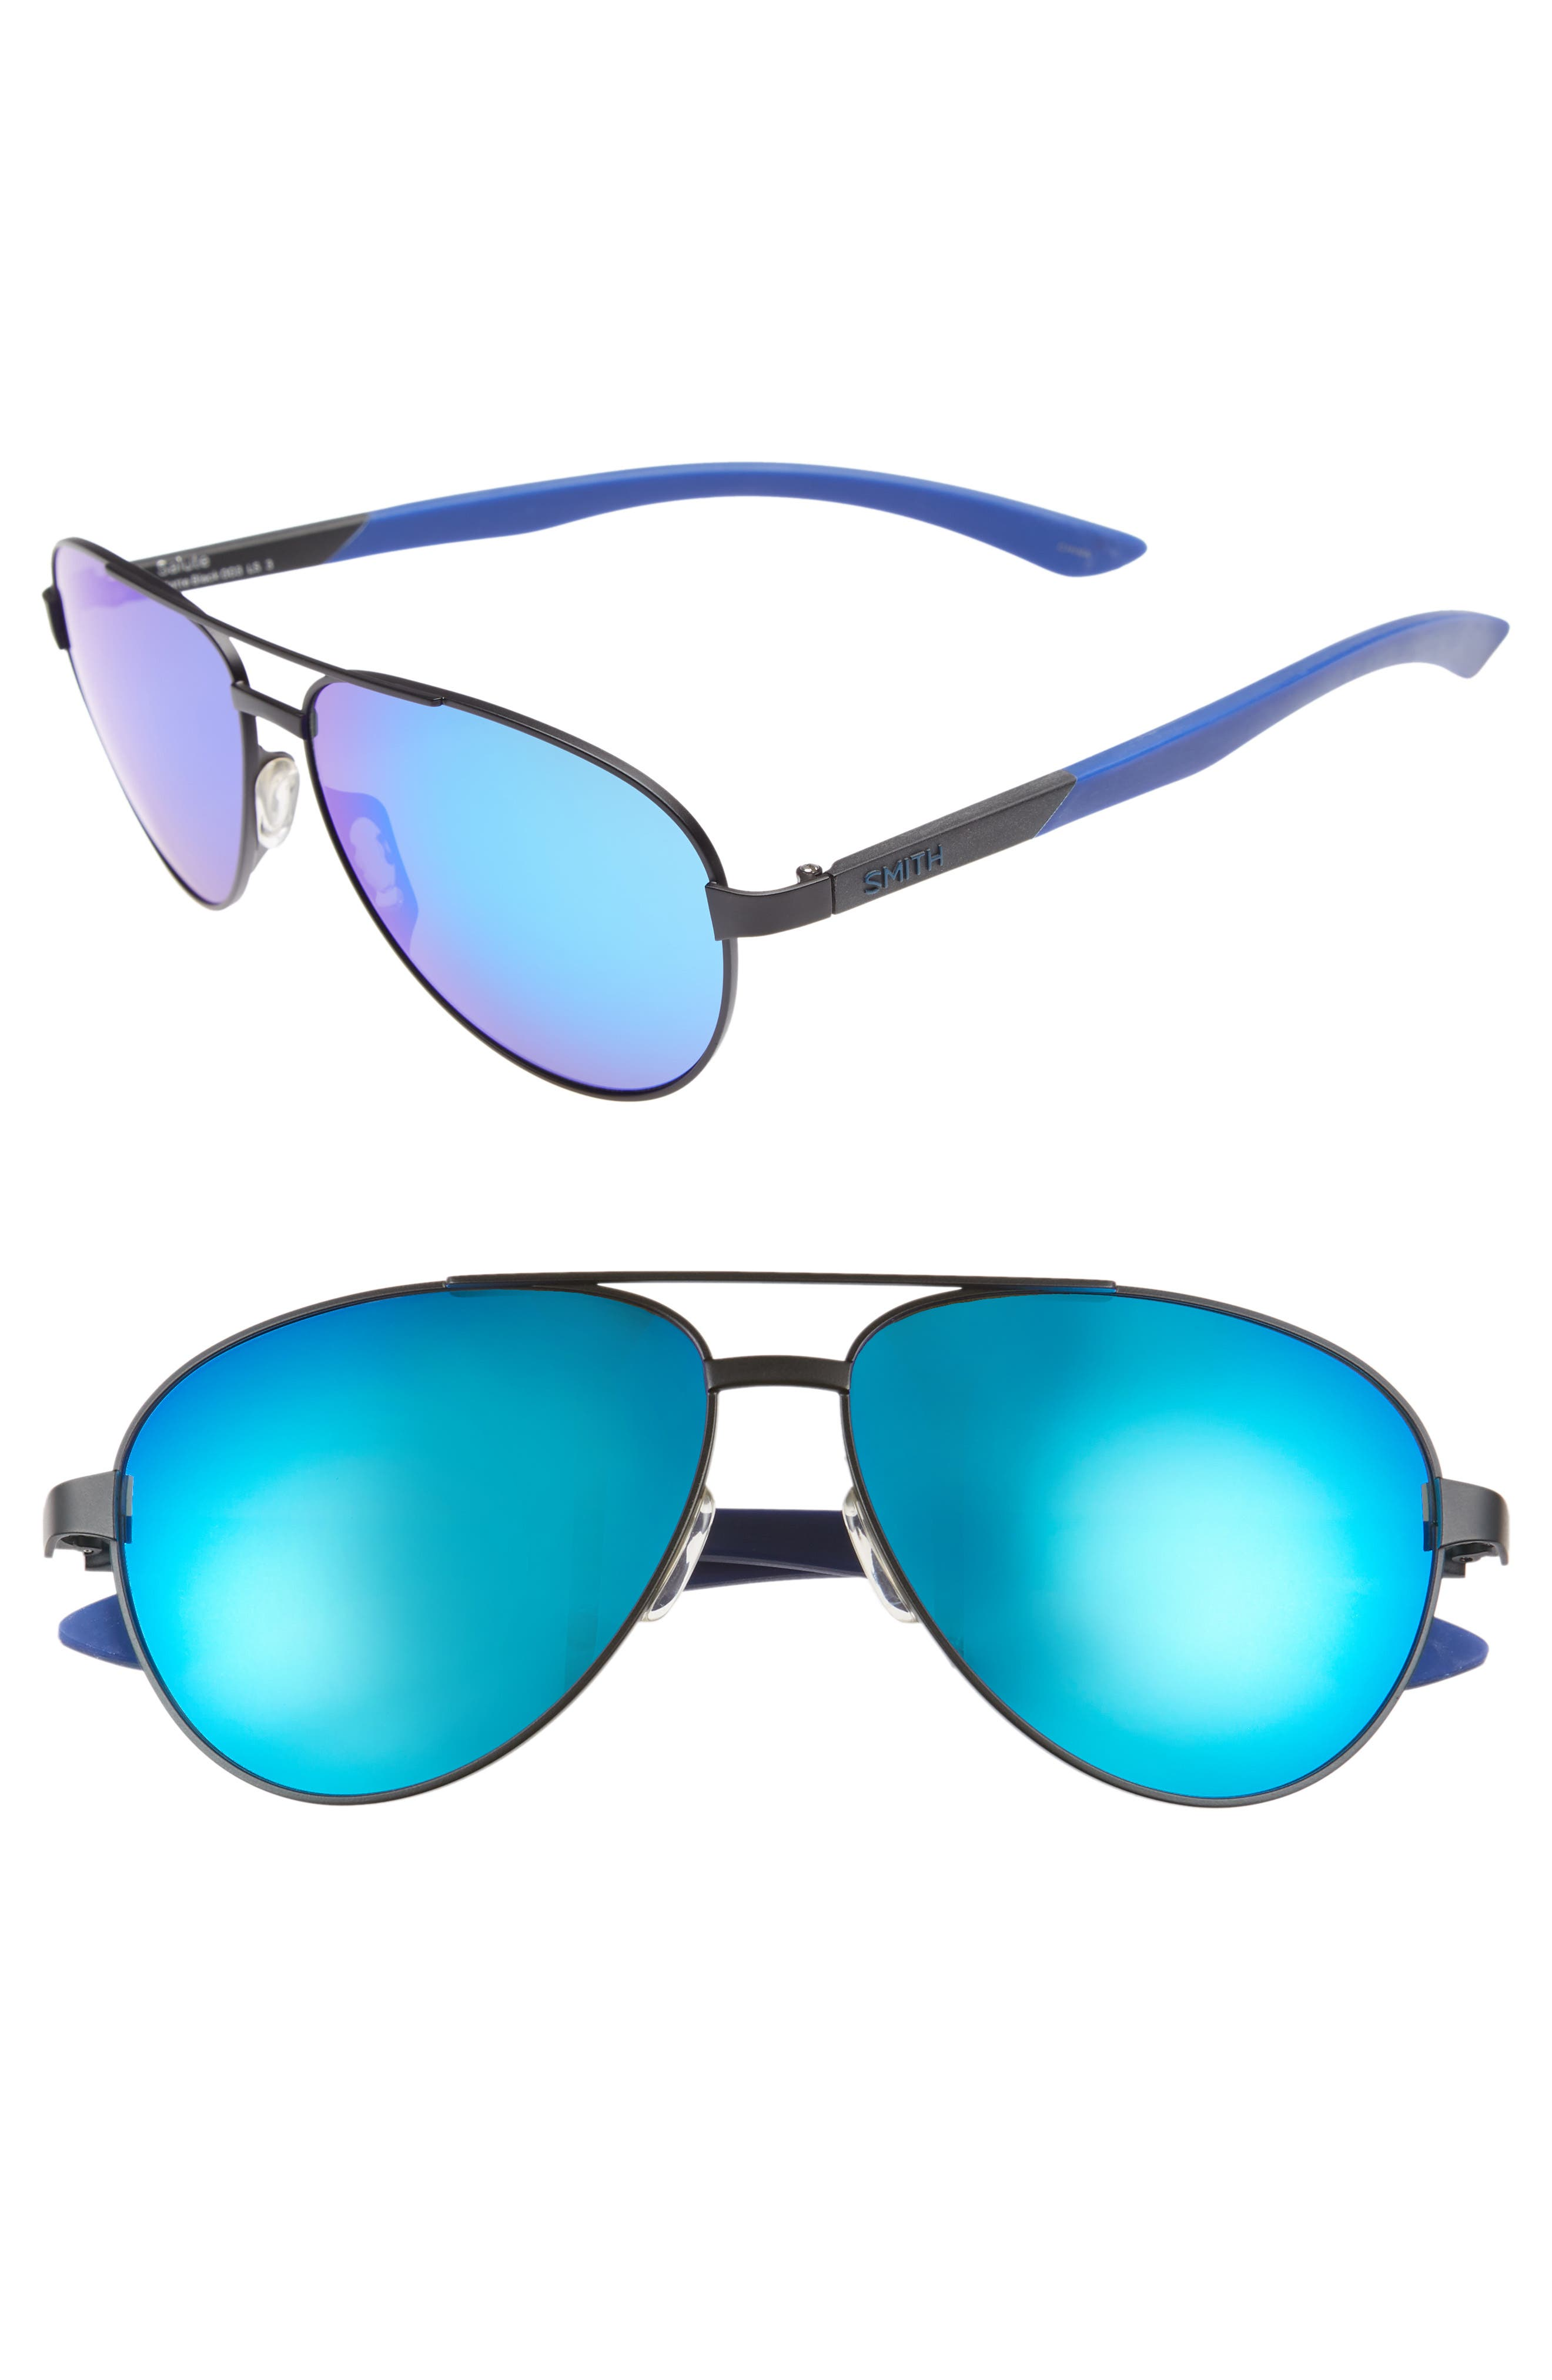 Salute 59mm Aviator Sunglasses,                             Main thumbnail 1, color,                             001